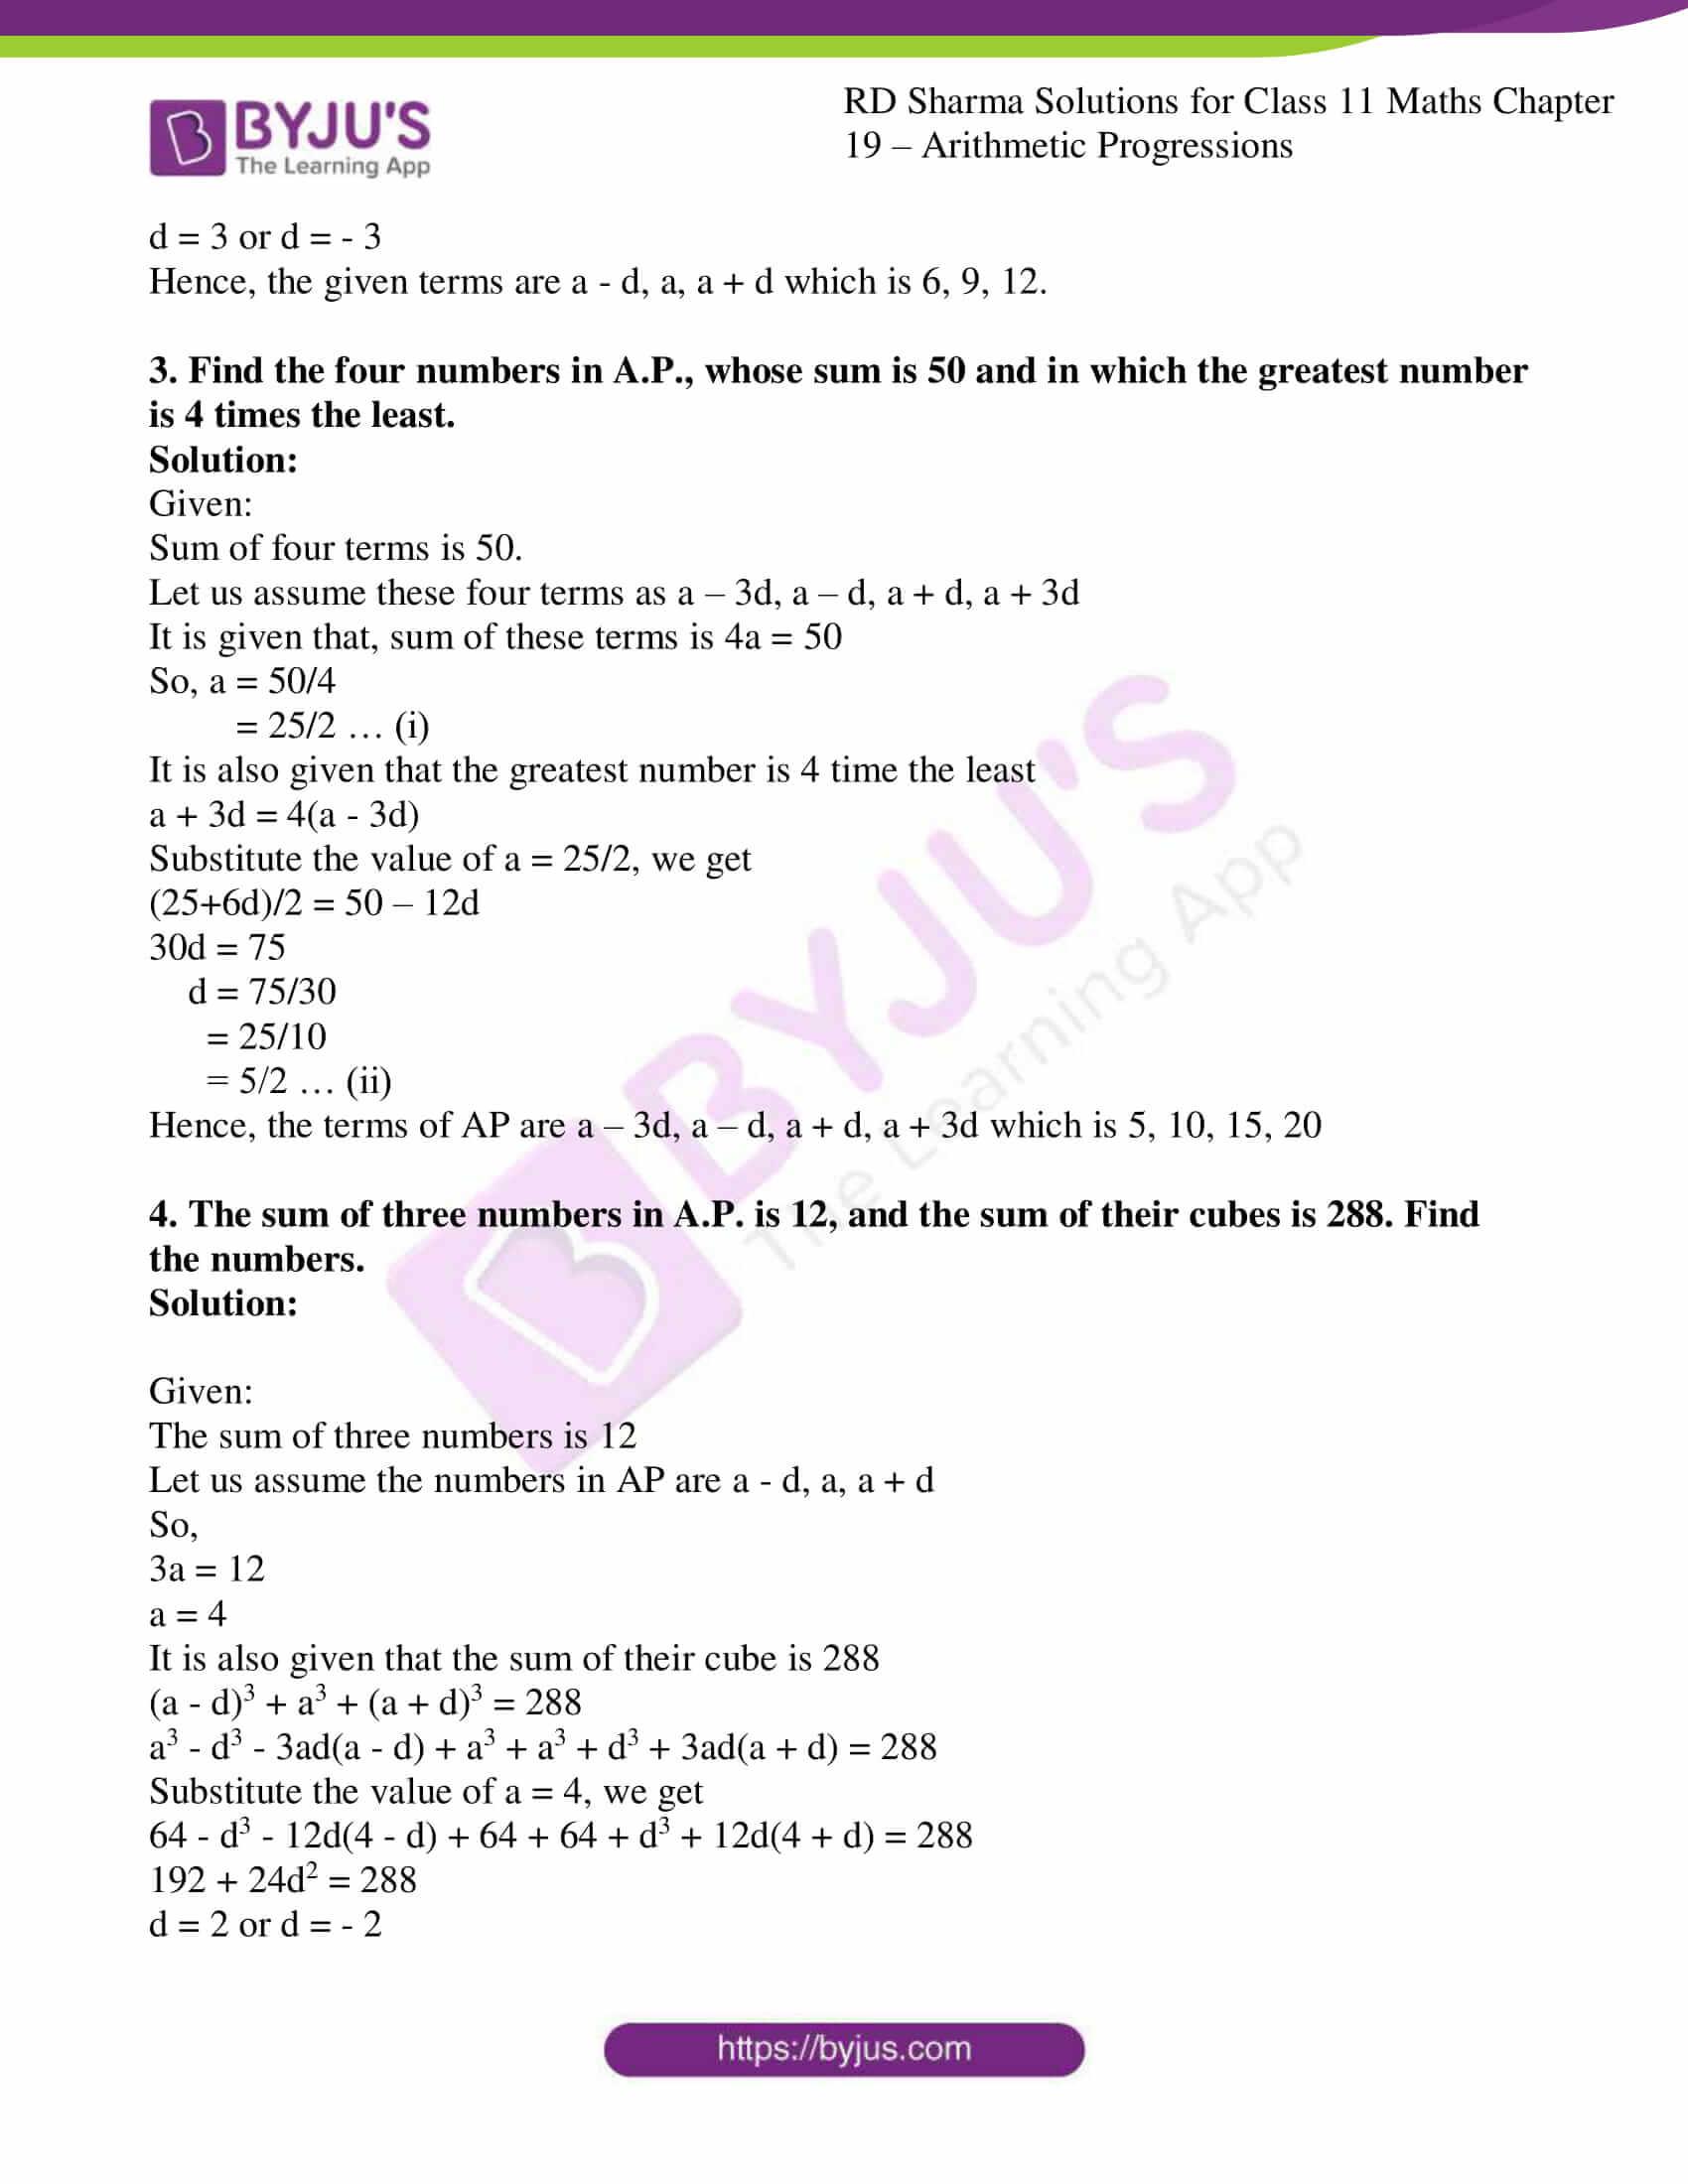 rd sharma class 11 maths ch 19 ex 3 2